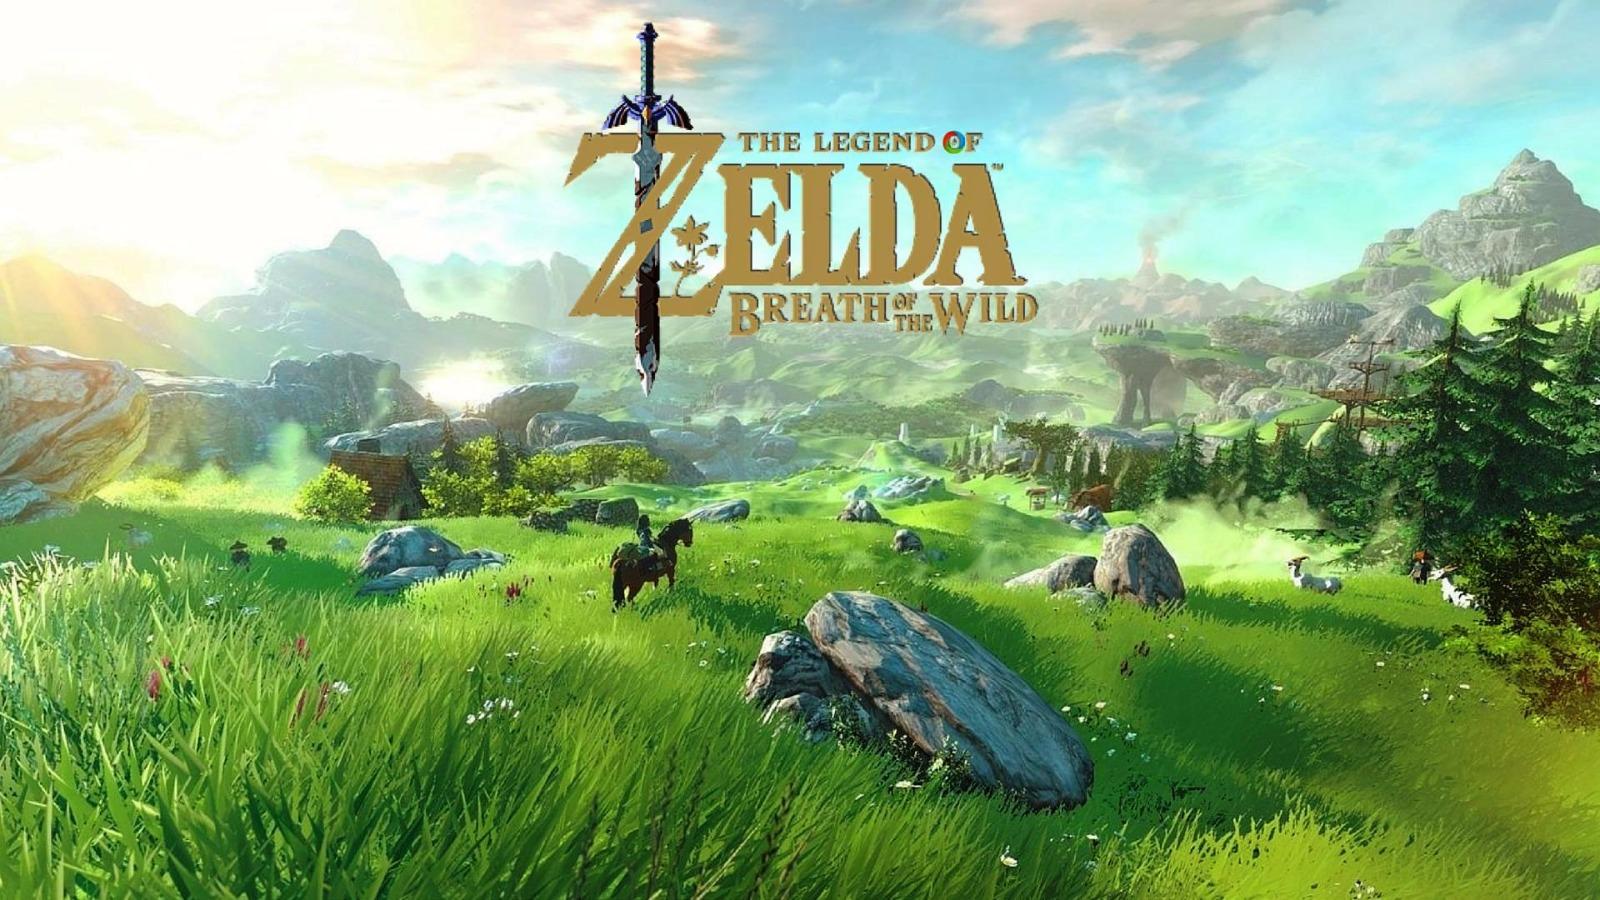 The Legend Of Zelda Breath Of The Wild Walkthrough And Guide Neoseeker